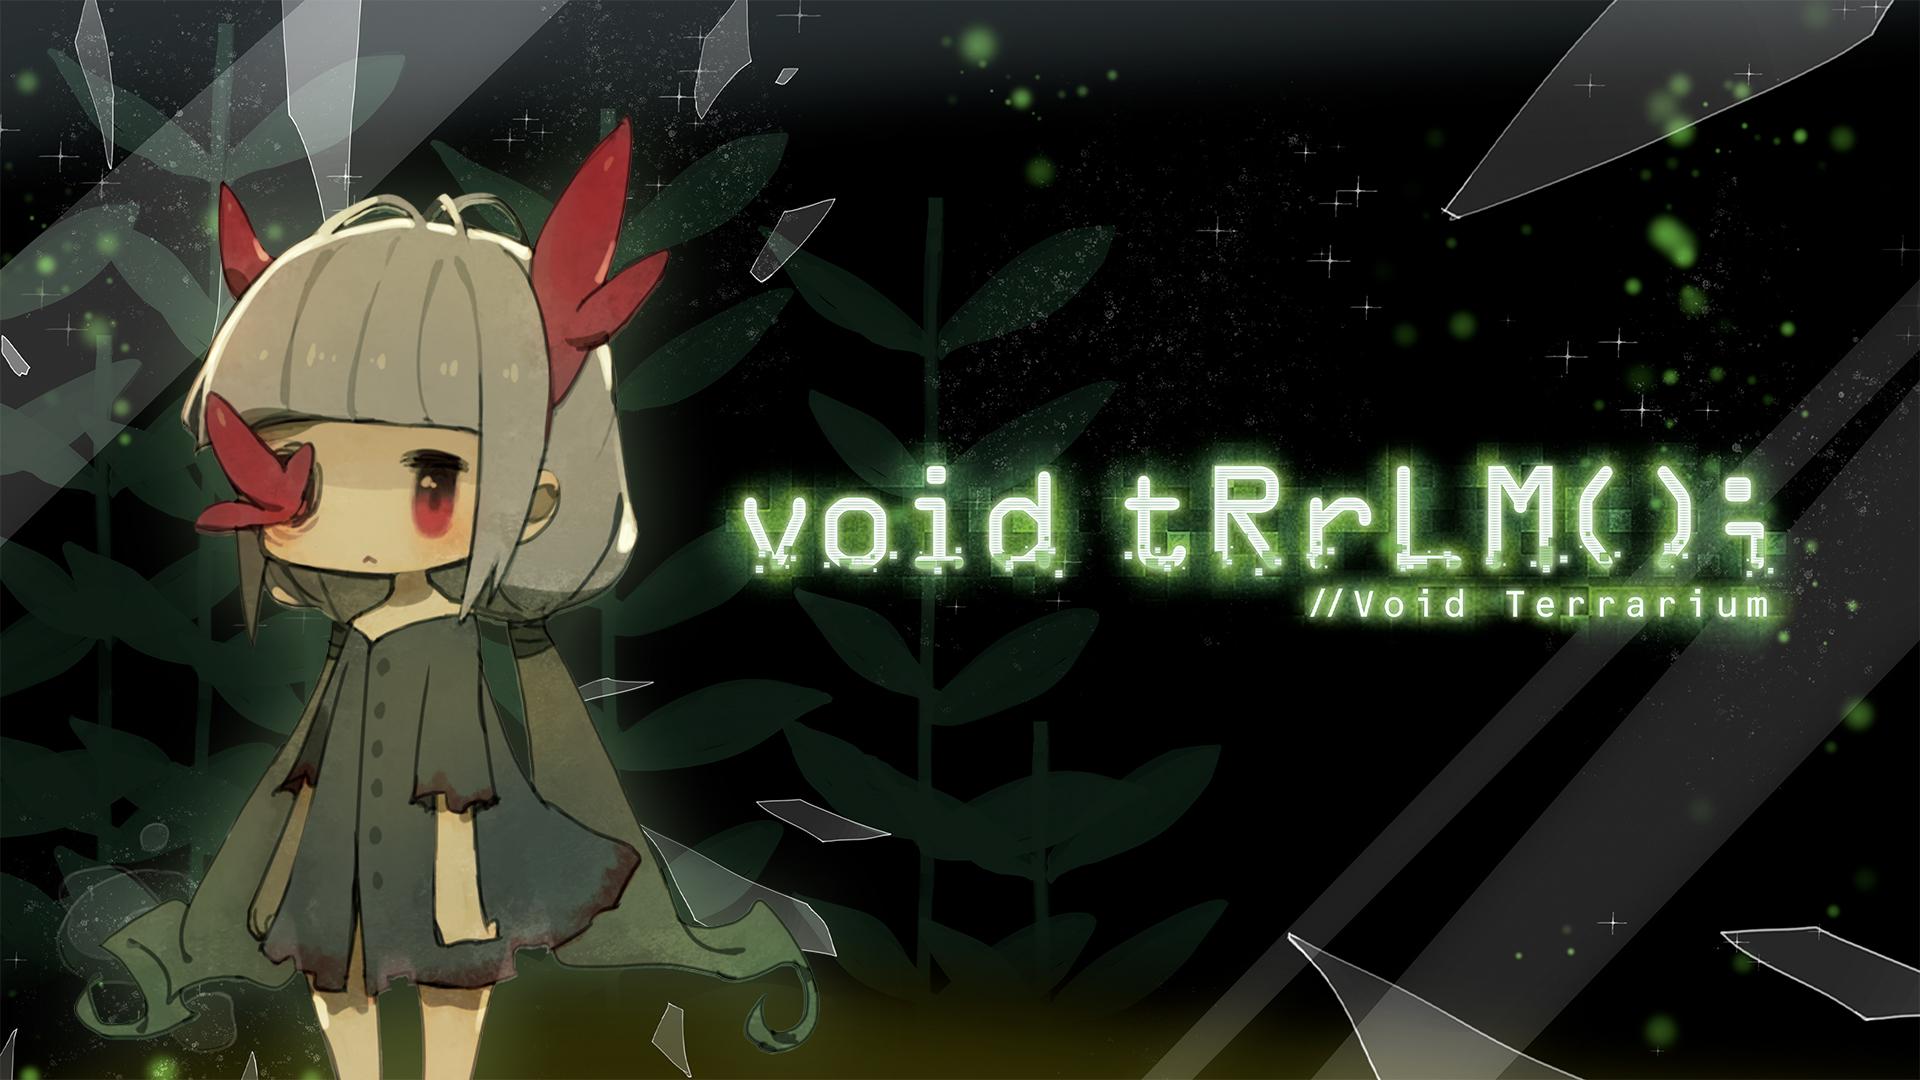 Read more about the article void tRrLM(); //Void Terrarium